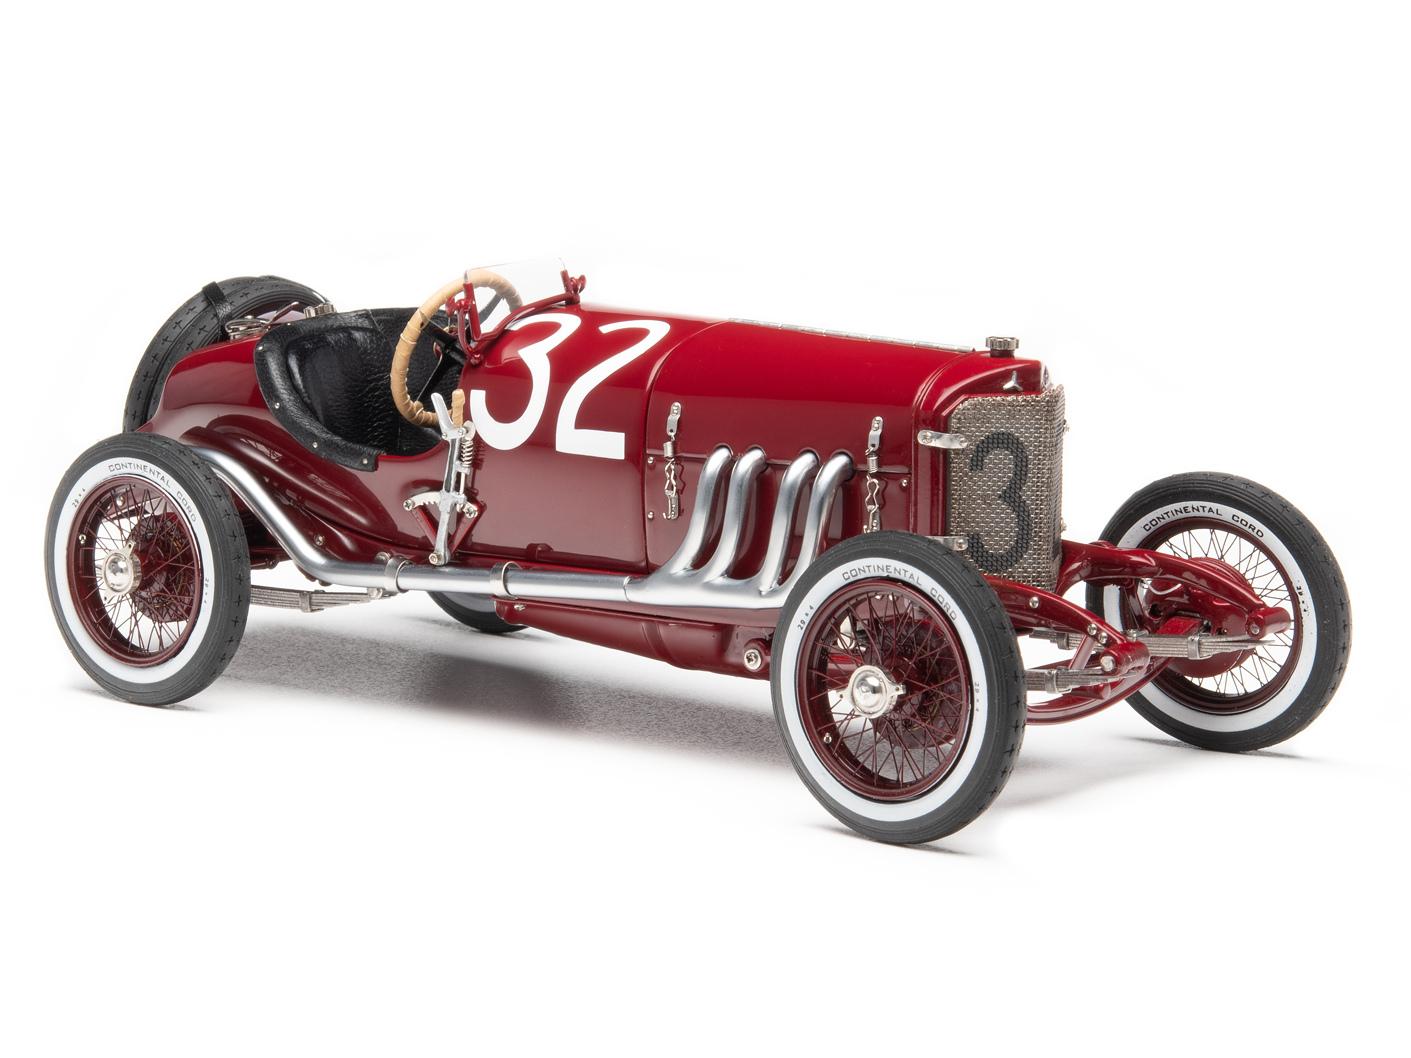 CMC/シーエムシー メルセデス タルガフローリオ 1924 #32 C. Lautenschlager / W. Traub